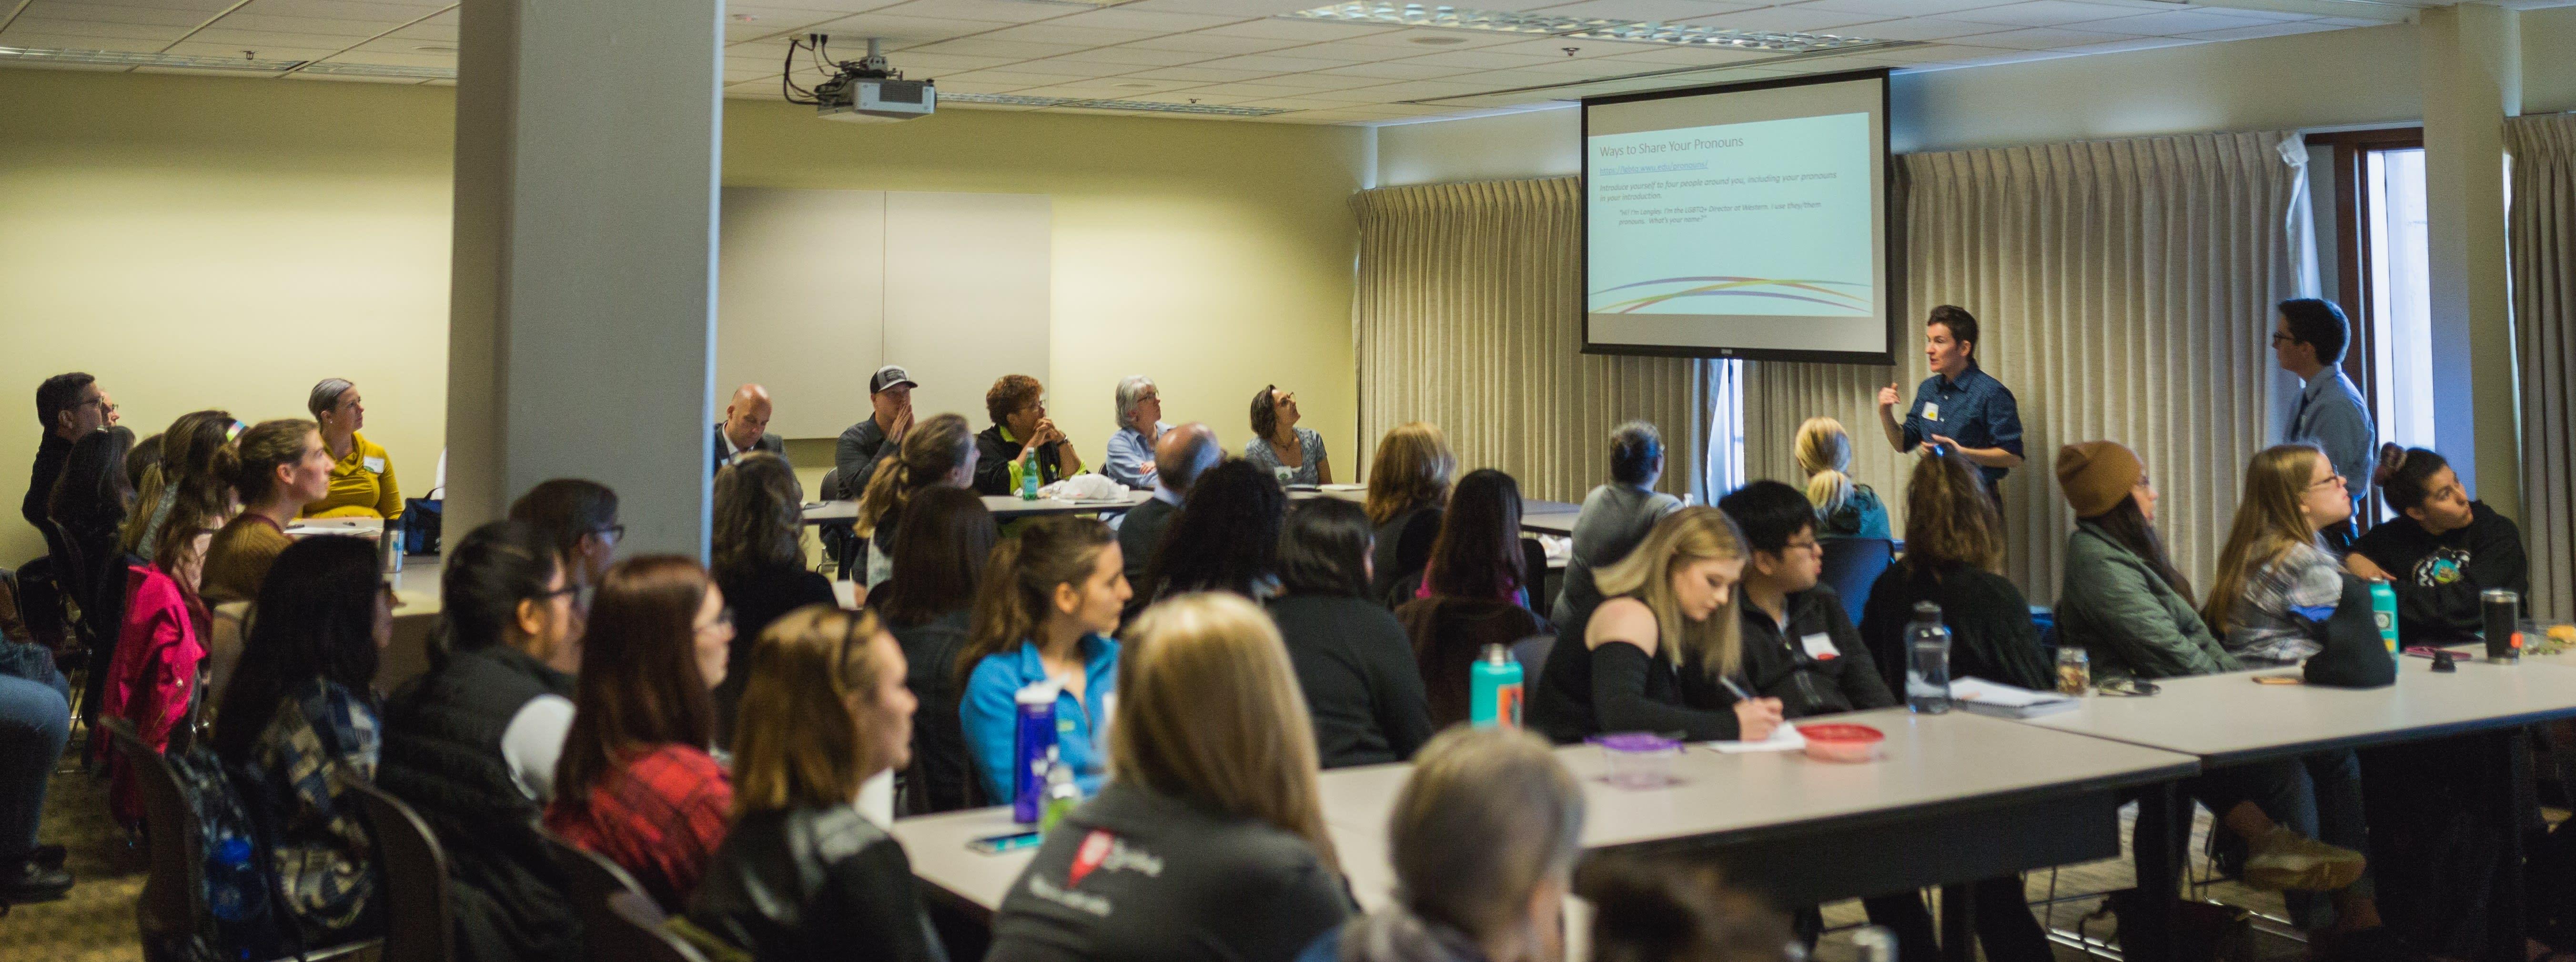 Photo of 2 facilitators leading full room of workshop participants.